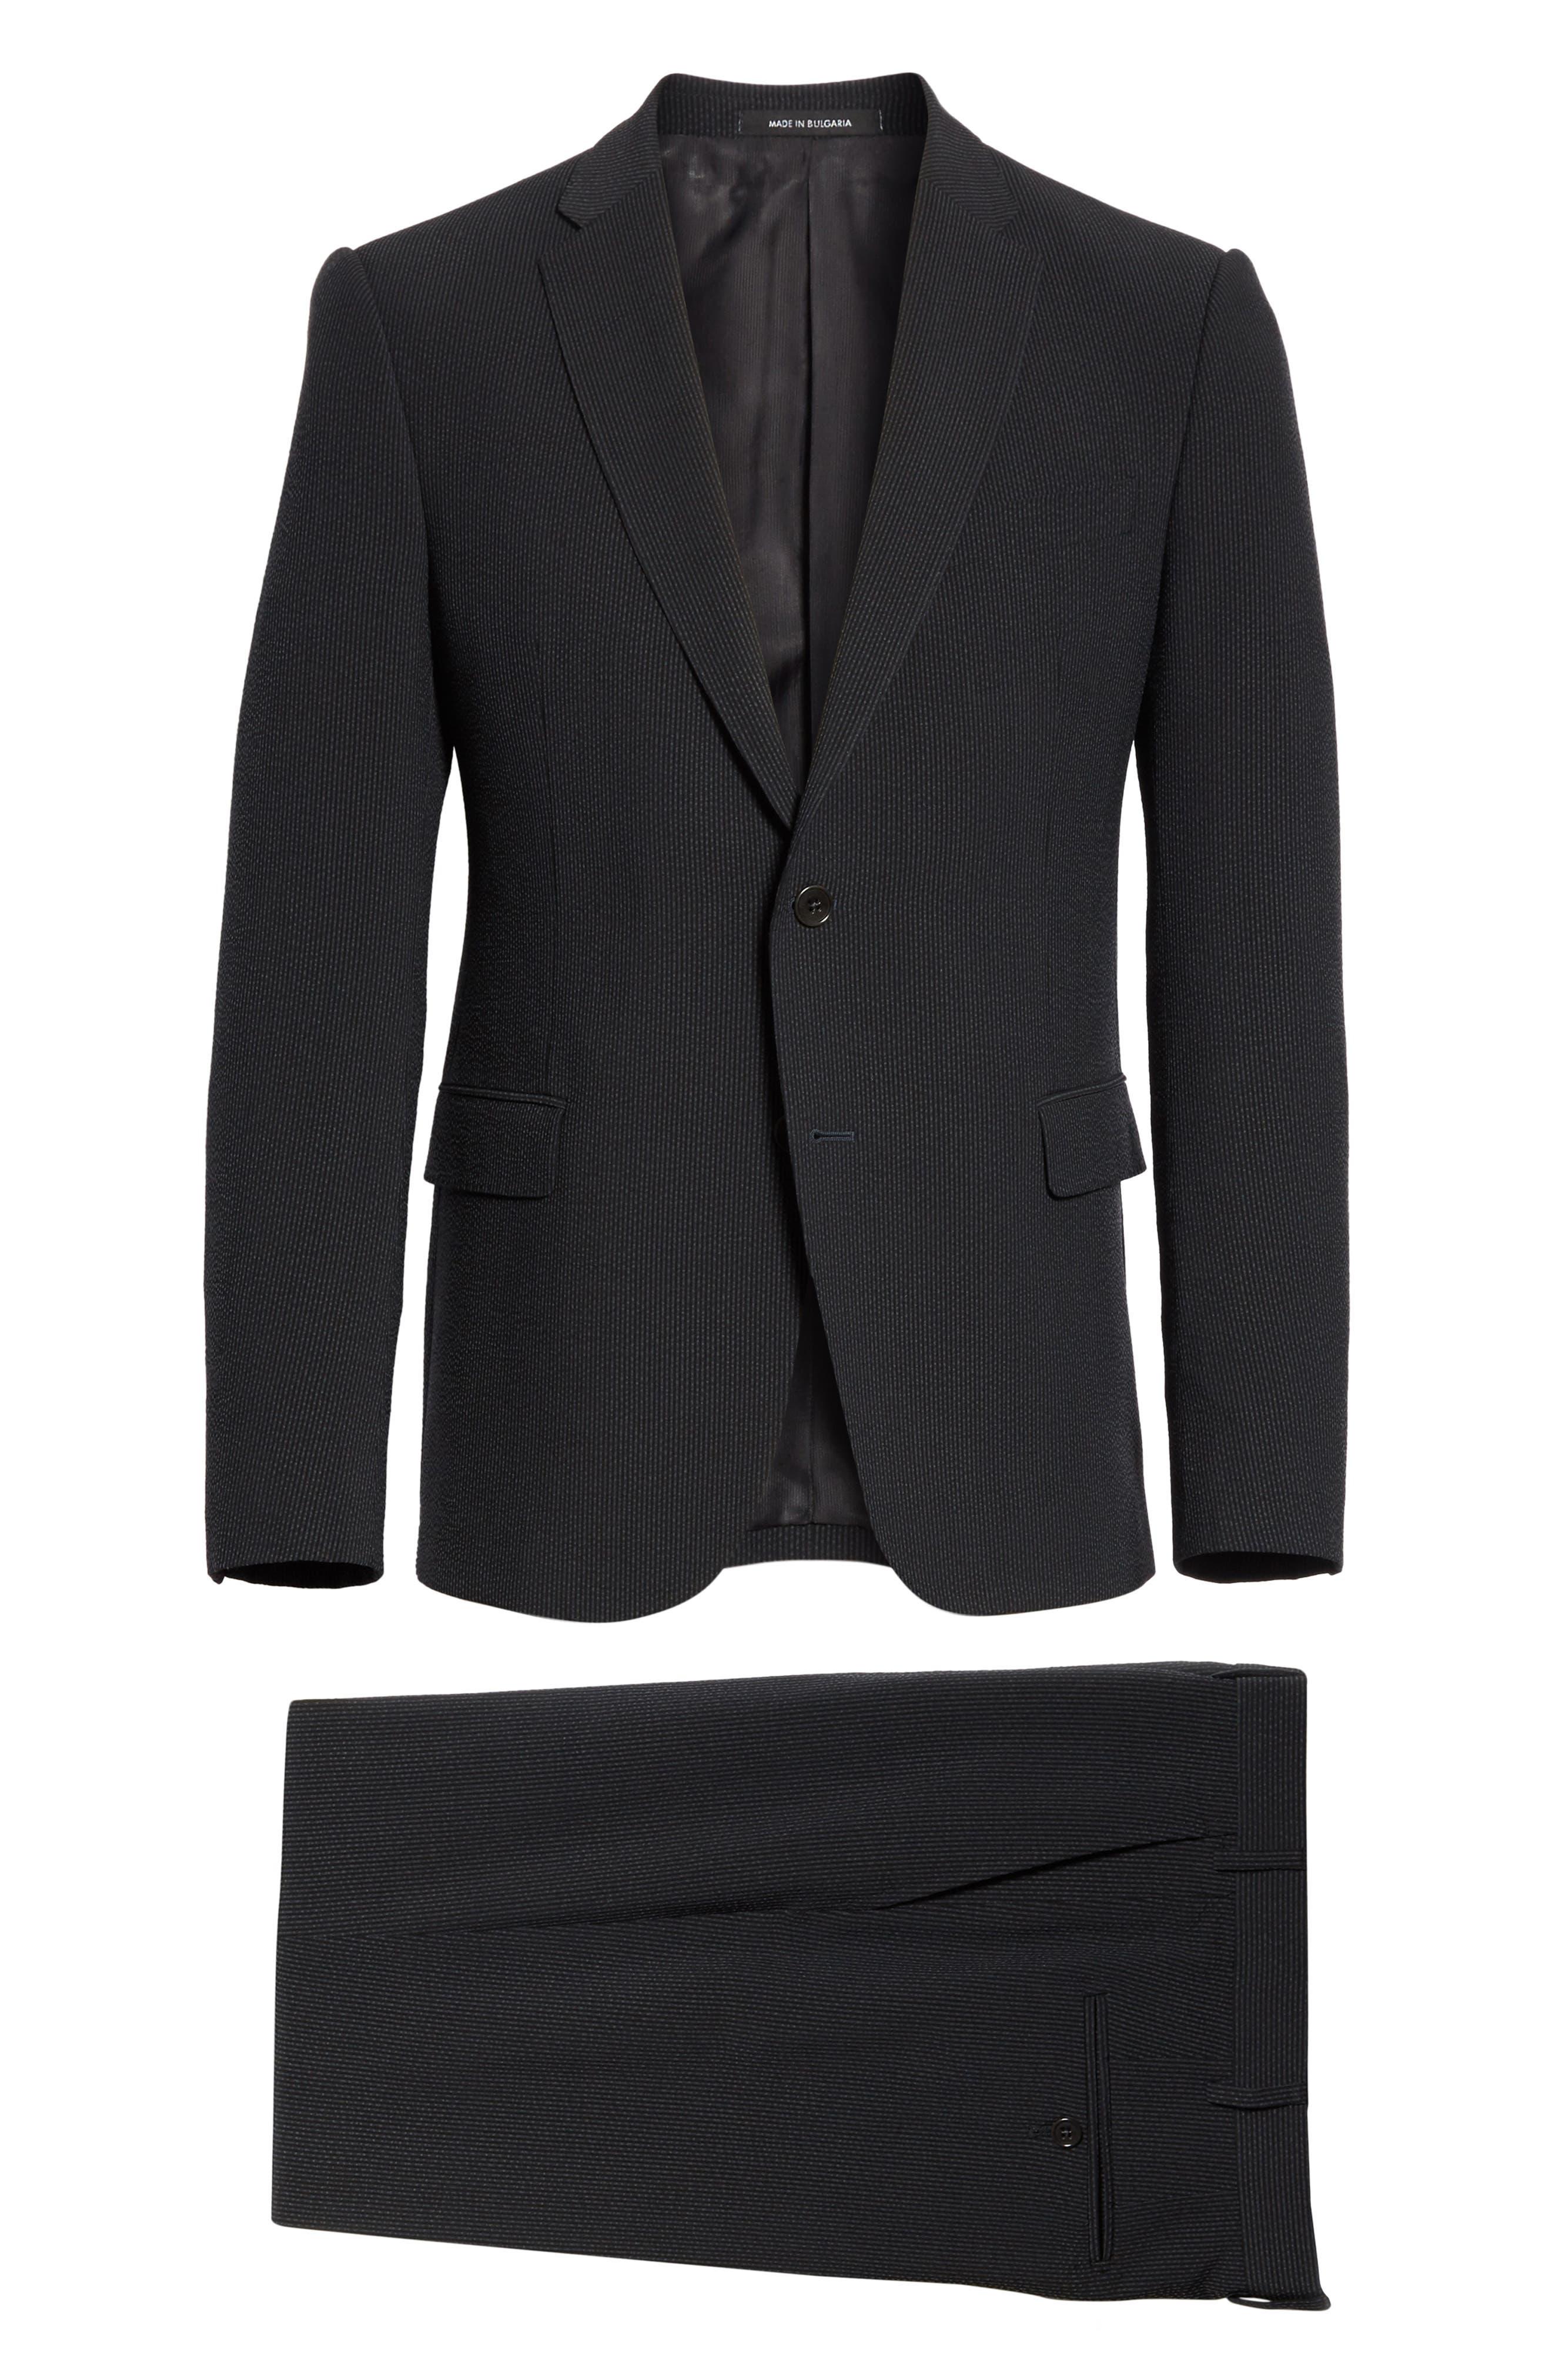 M Line Trim Fit Stretch Seersucker Wool Blend Suit,                             Alternate thumbnail 8, color,                             Grey